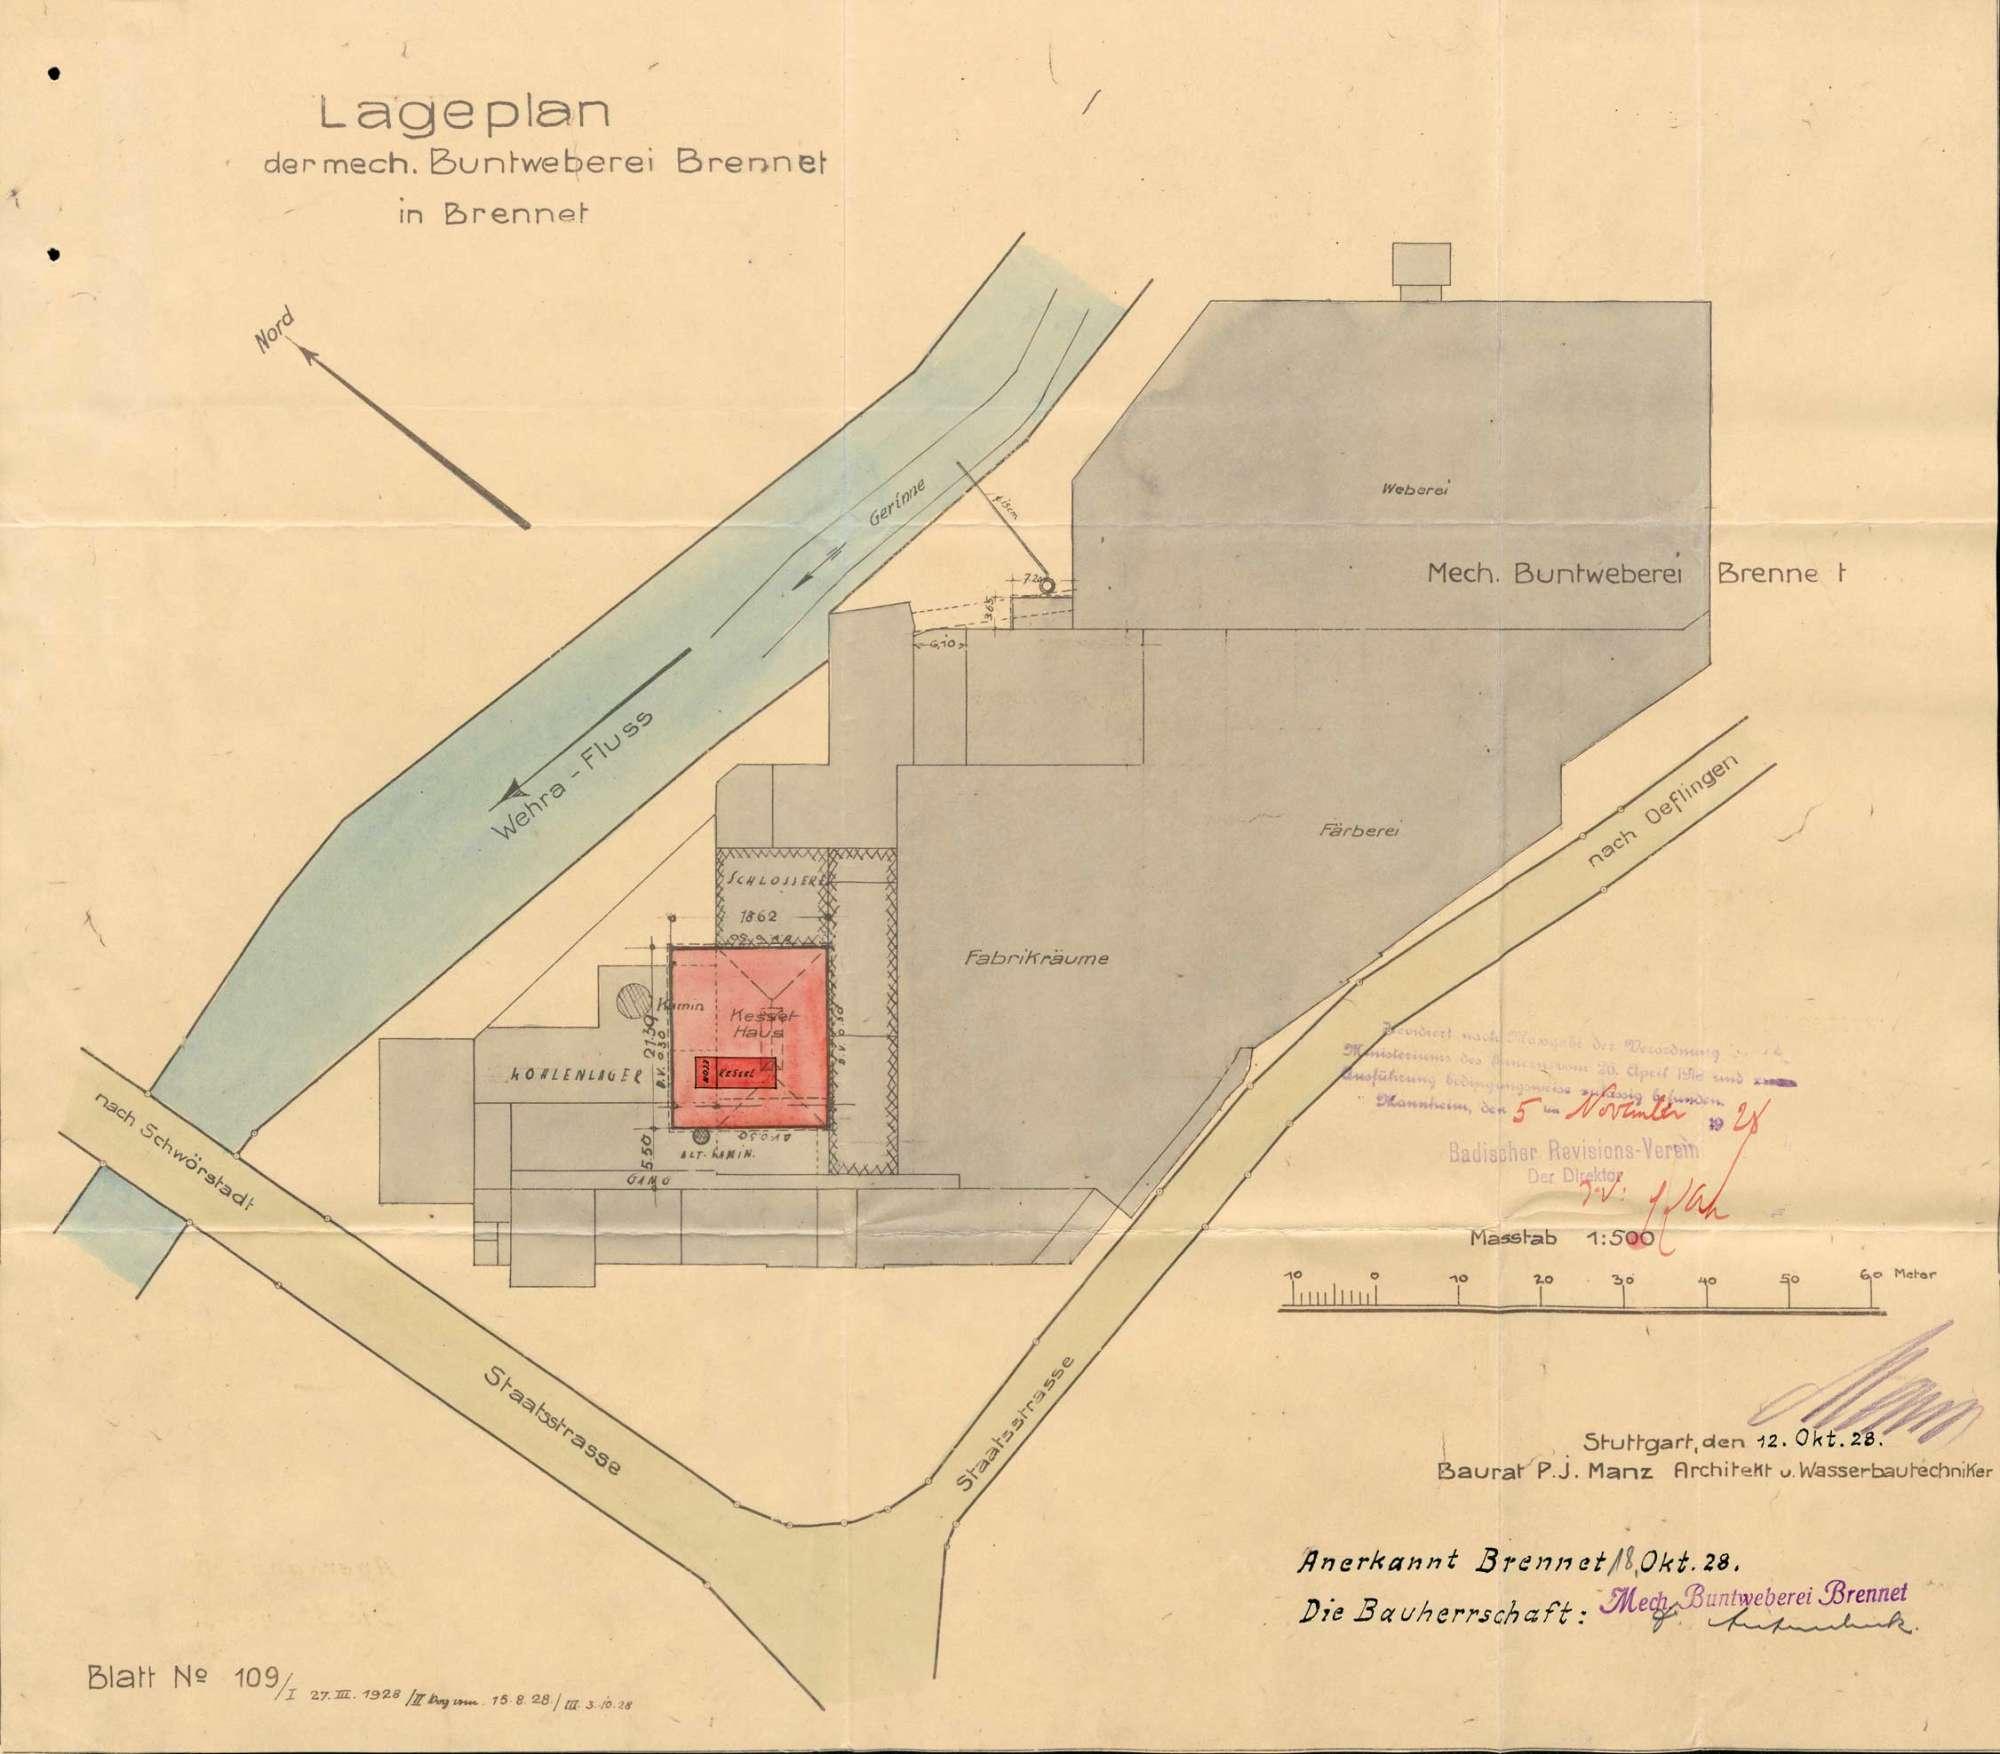 Dampfkessel der Firma C. A. Hipp & Co., Mechanische Buntweberei Brennet, in Öflingen, Bild 1